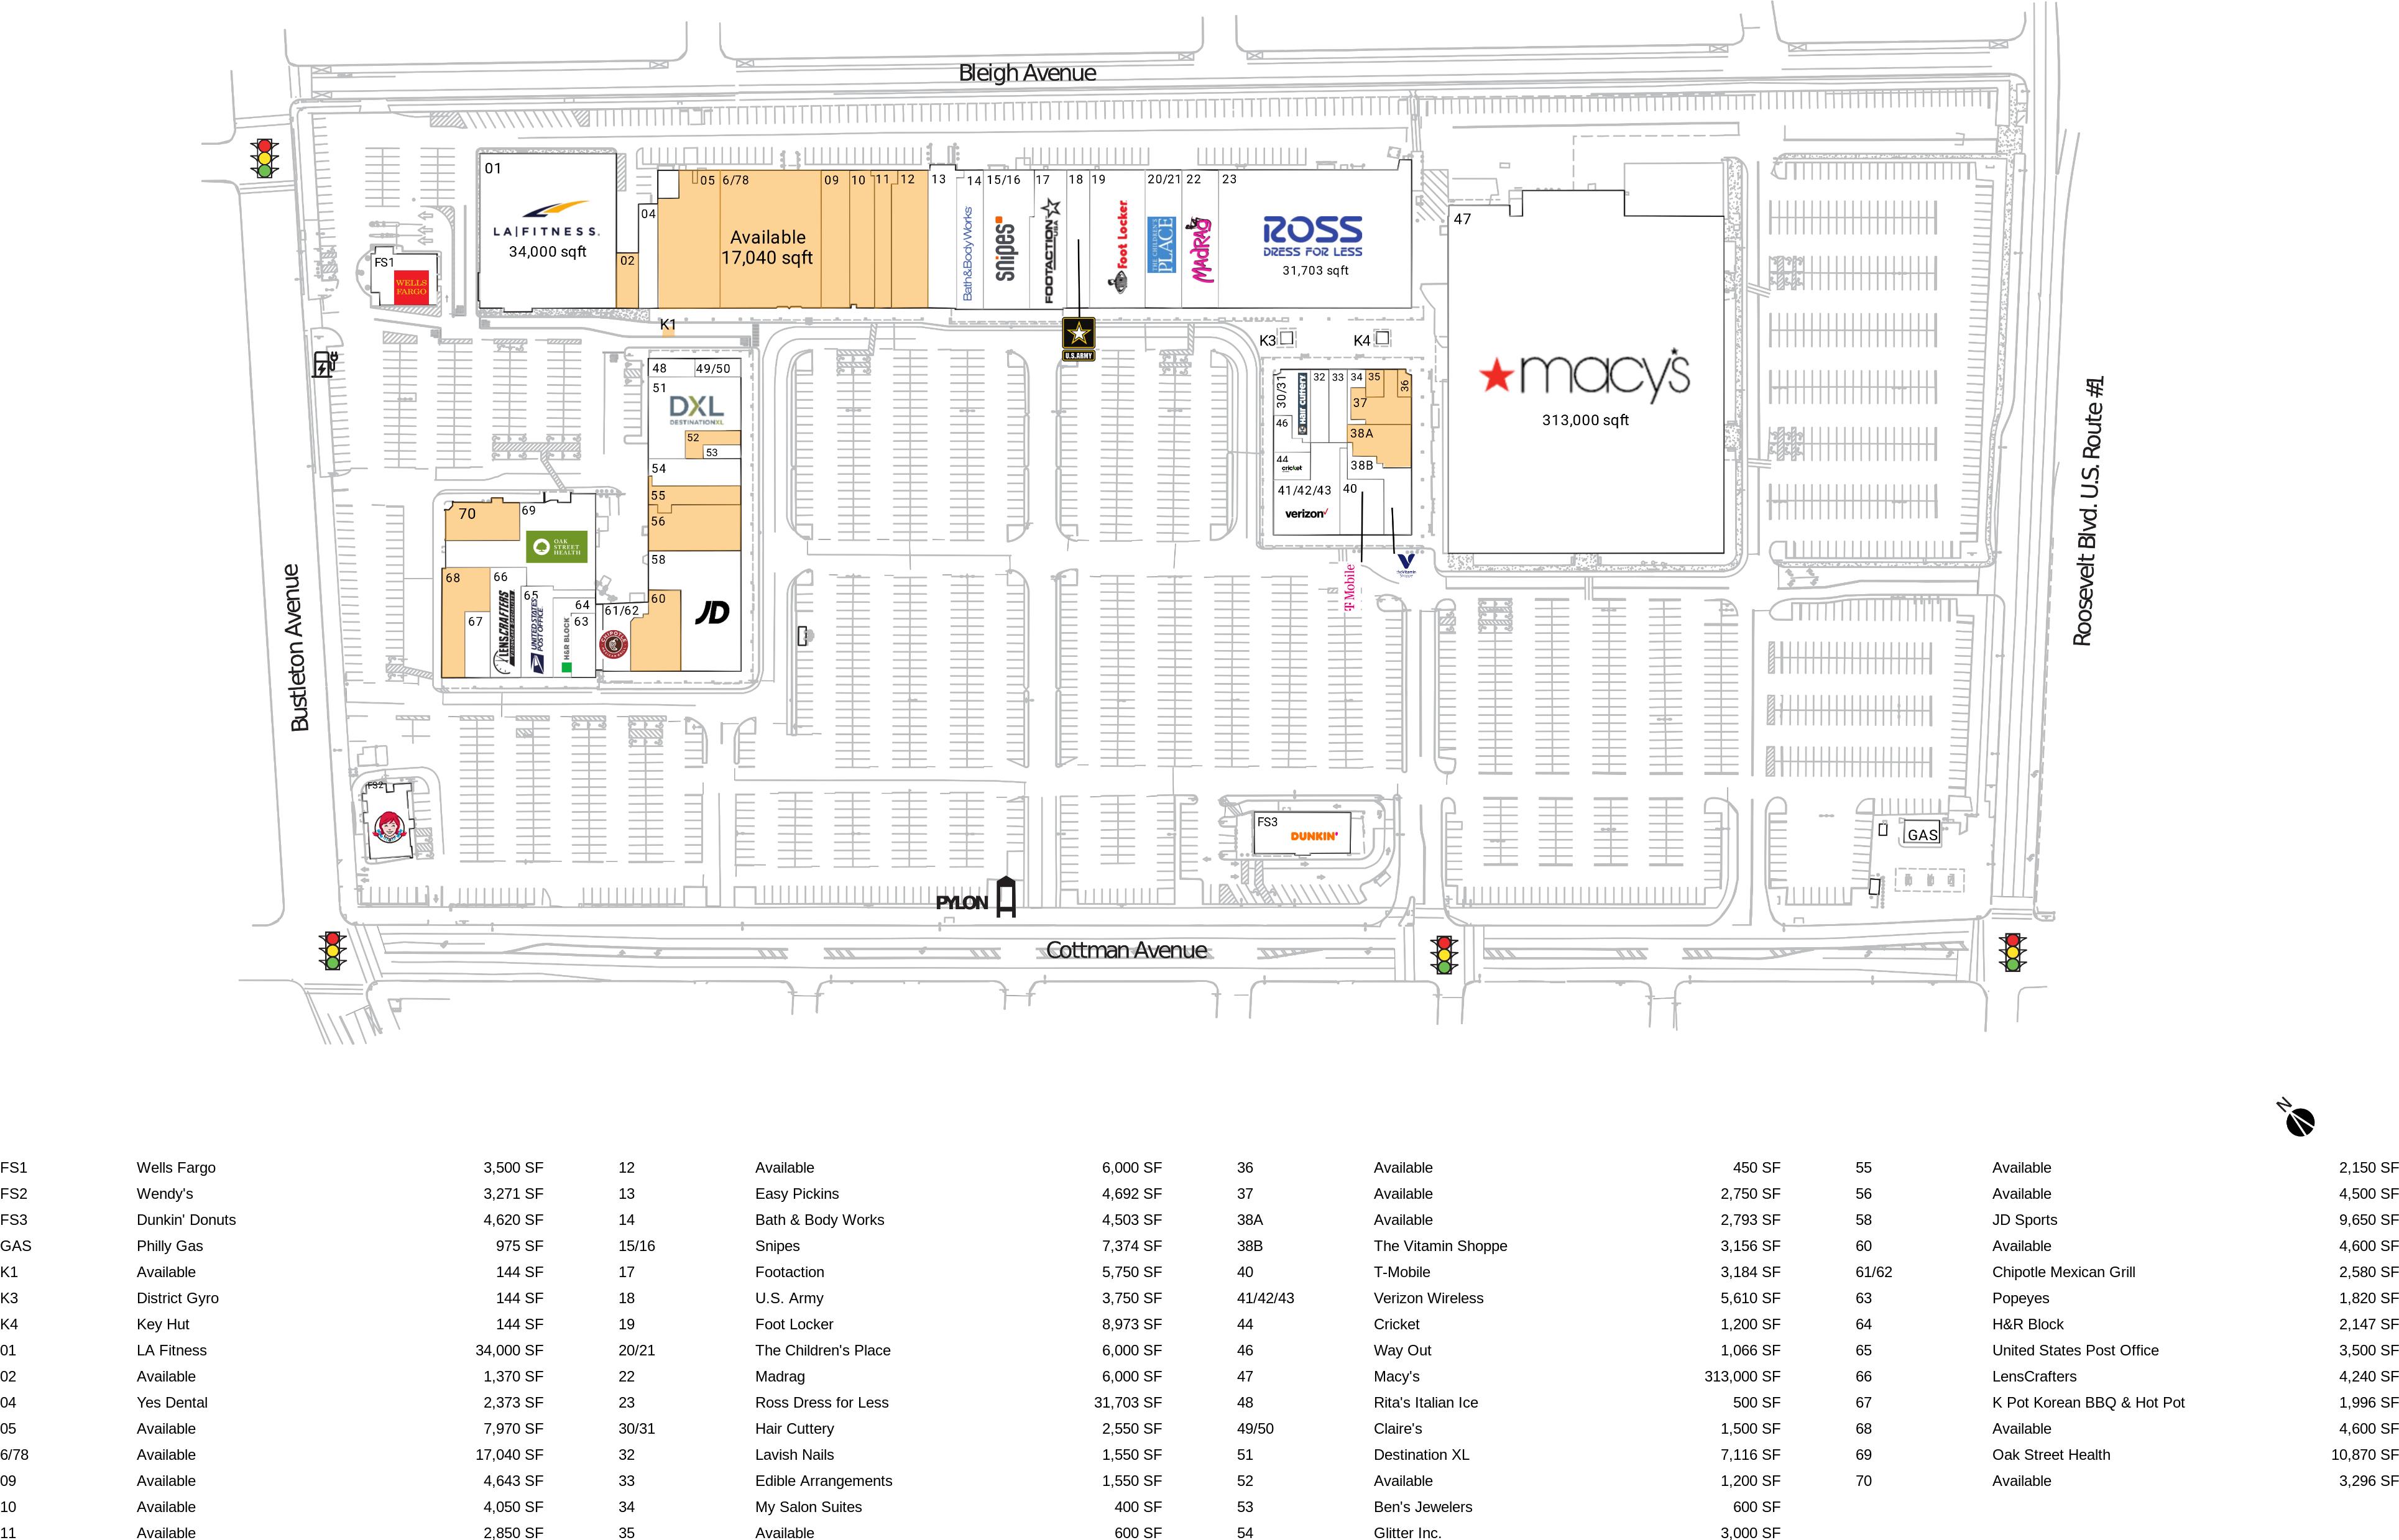 town center mall map popular  list penn square mall map. town center mall map popular  list easton town center map new